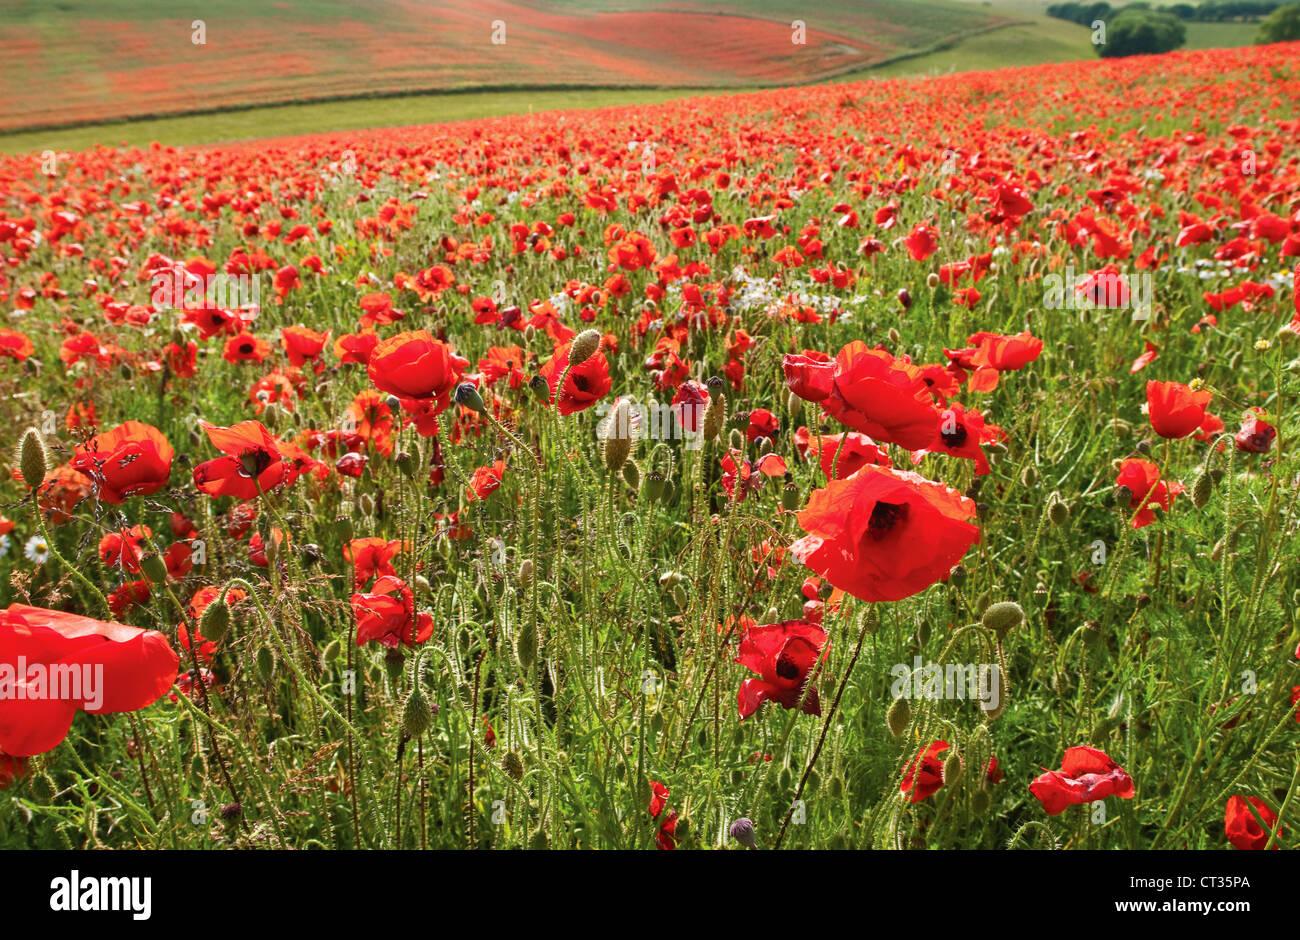 Field poppy, Papaver rhoeas, field of red poppies. - Stock Image